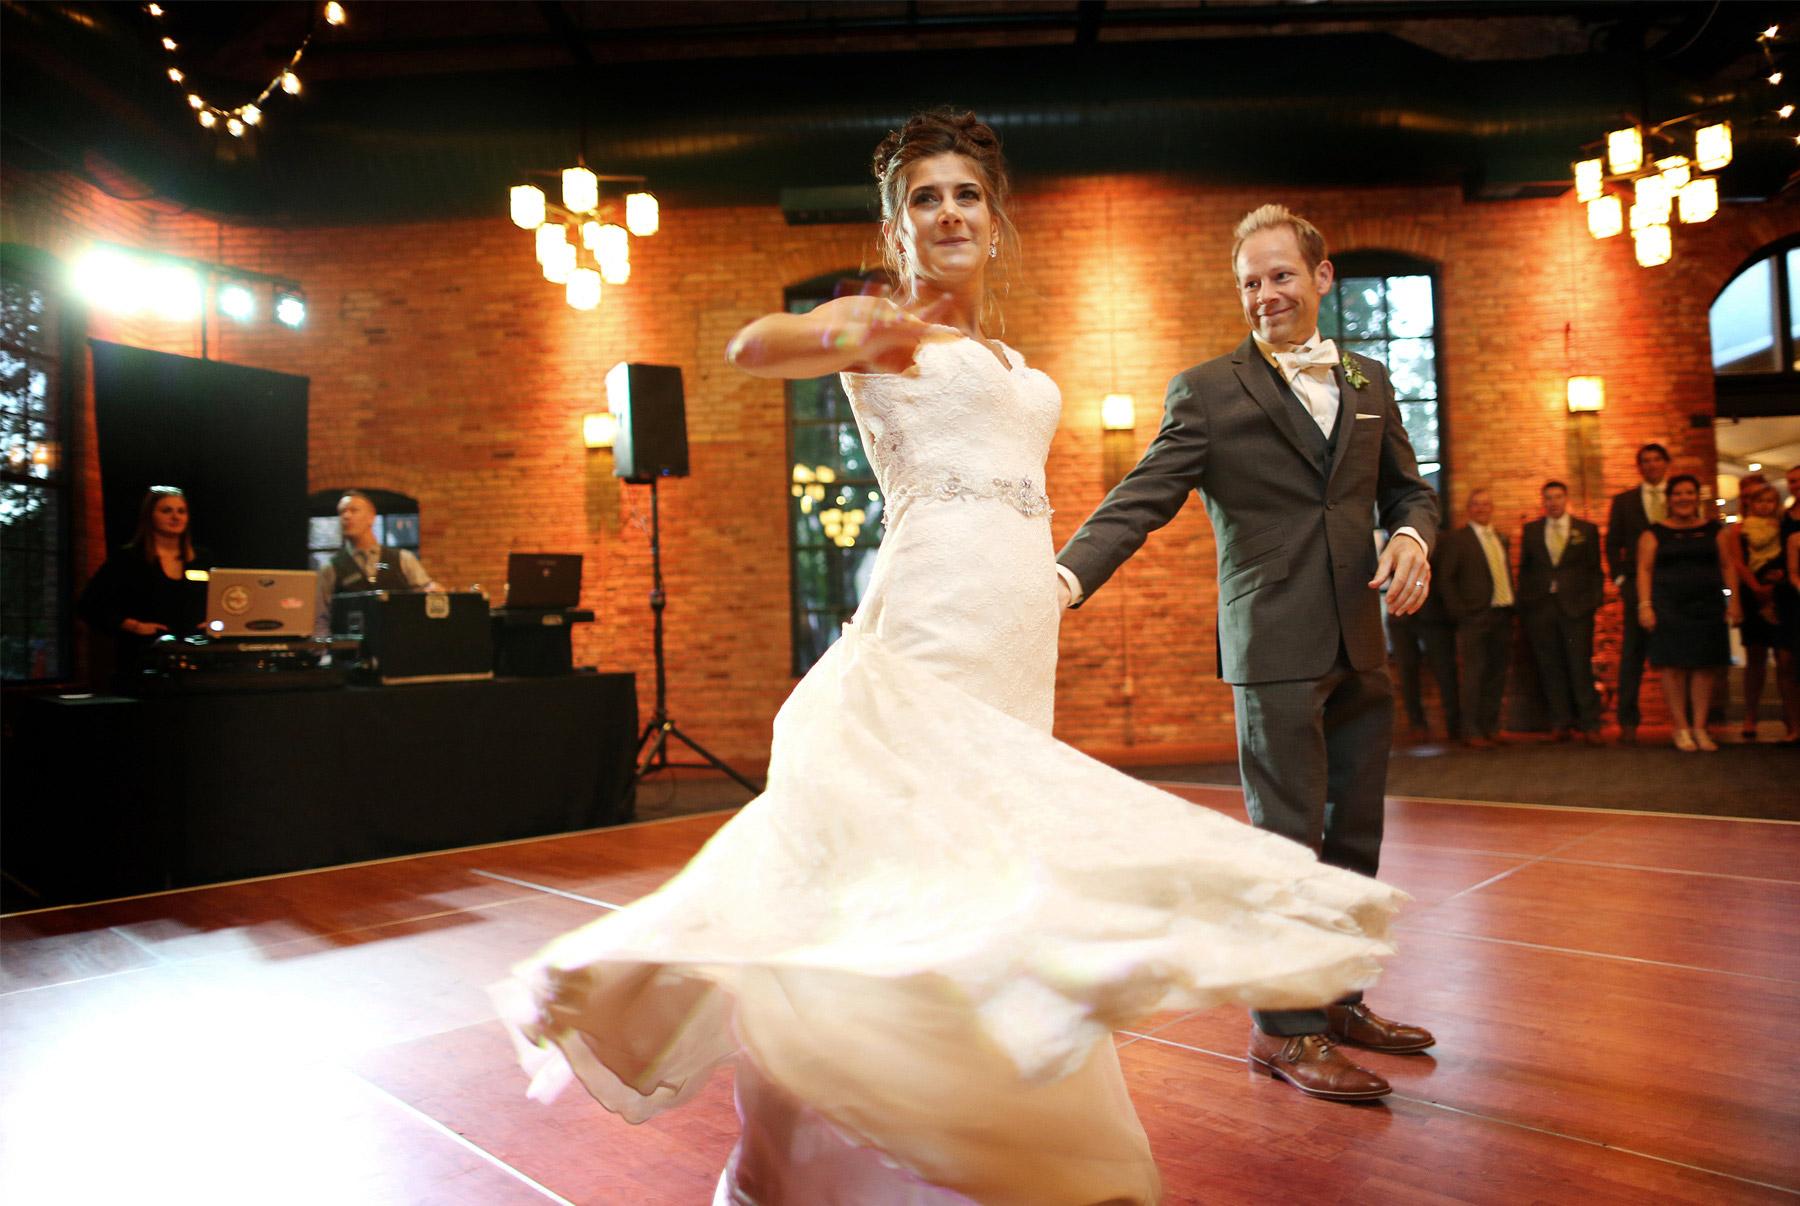 25-Minneapolis-Minnesota-Wedding-Photographer-by-Andrew-Vick-Photography-Fall-Autumn-Nicollet-Island-Pavillion-Bride-Groom-Dance-Spin-Twirl-Paula-and-Jason.jpg